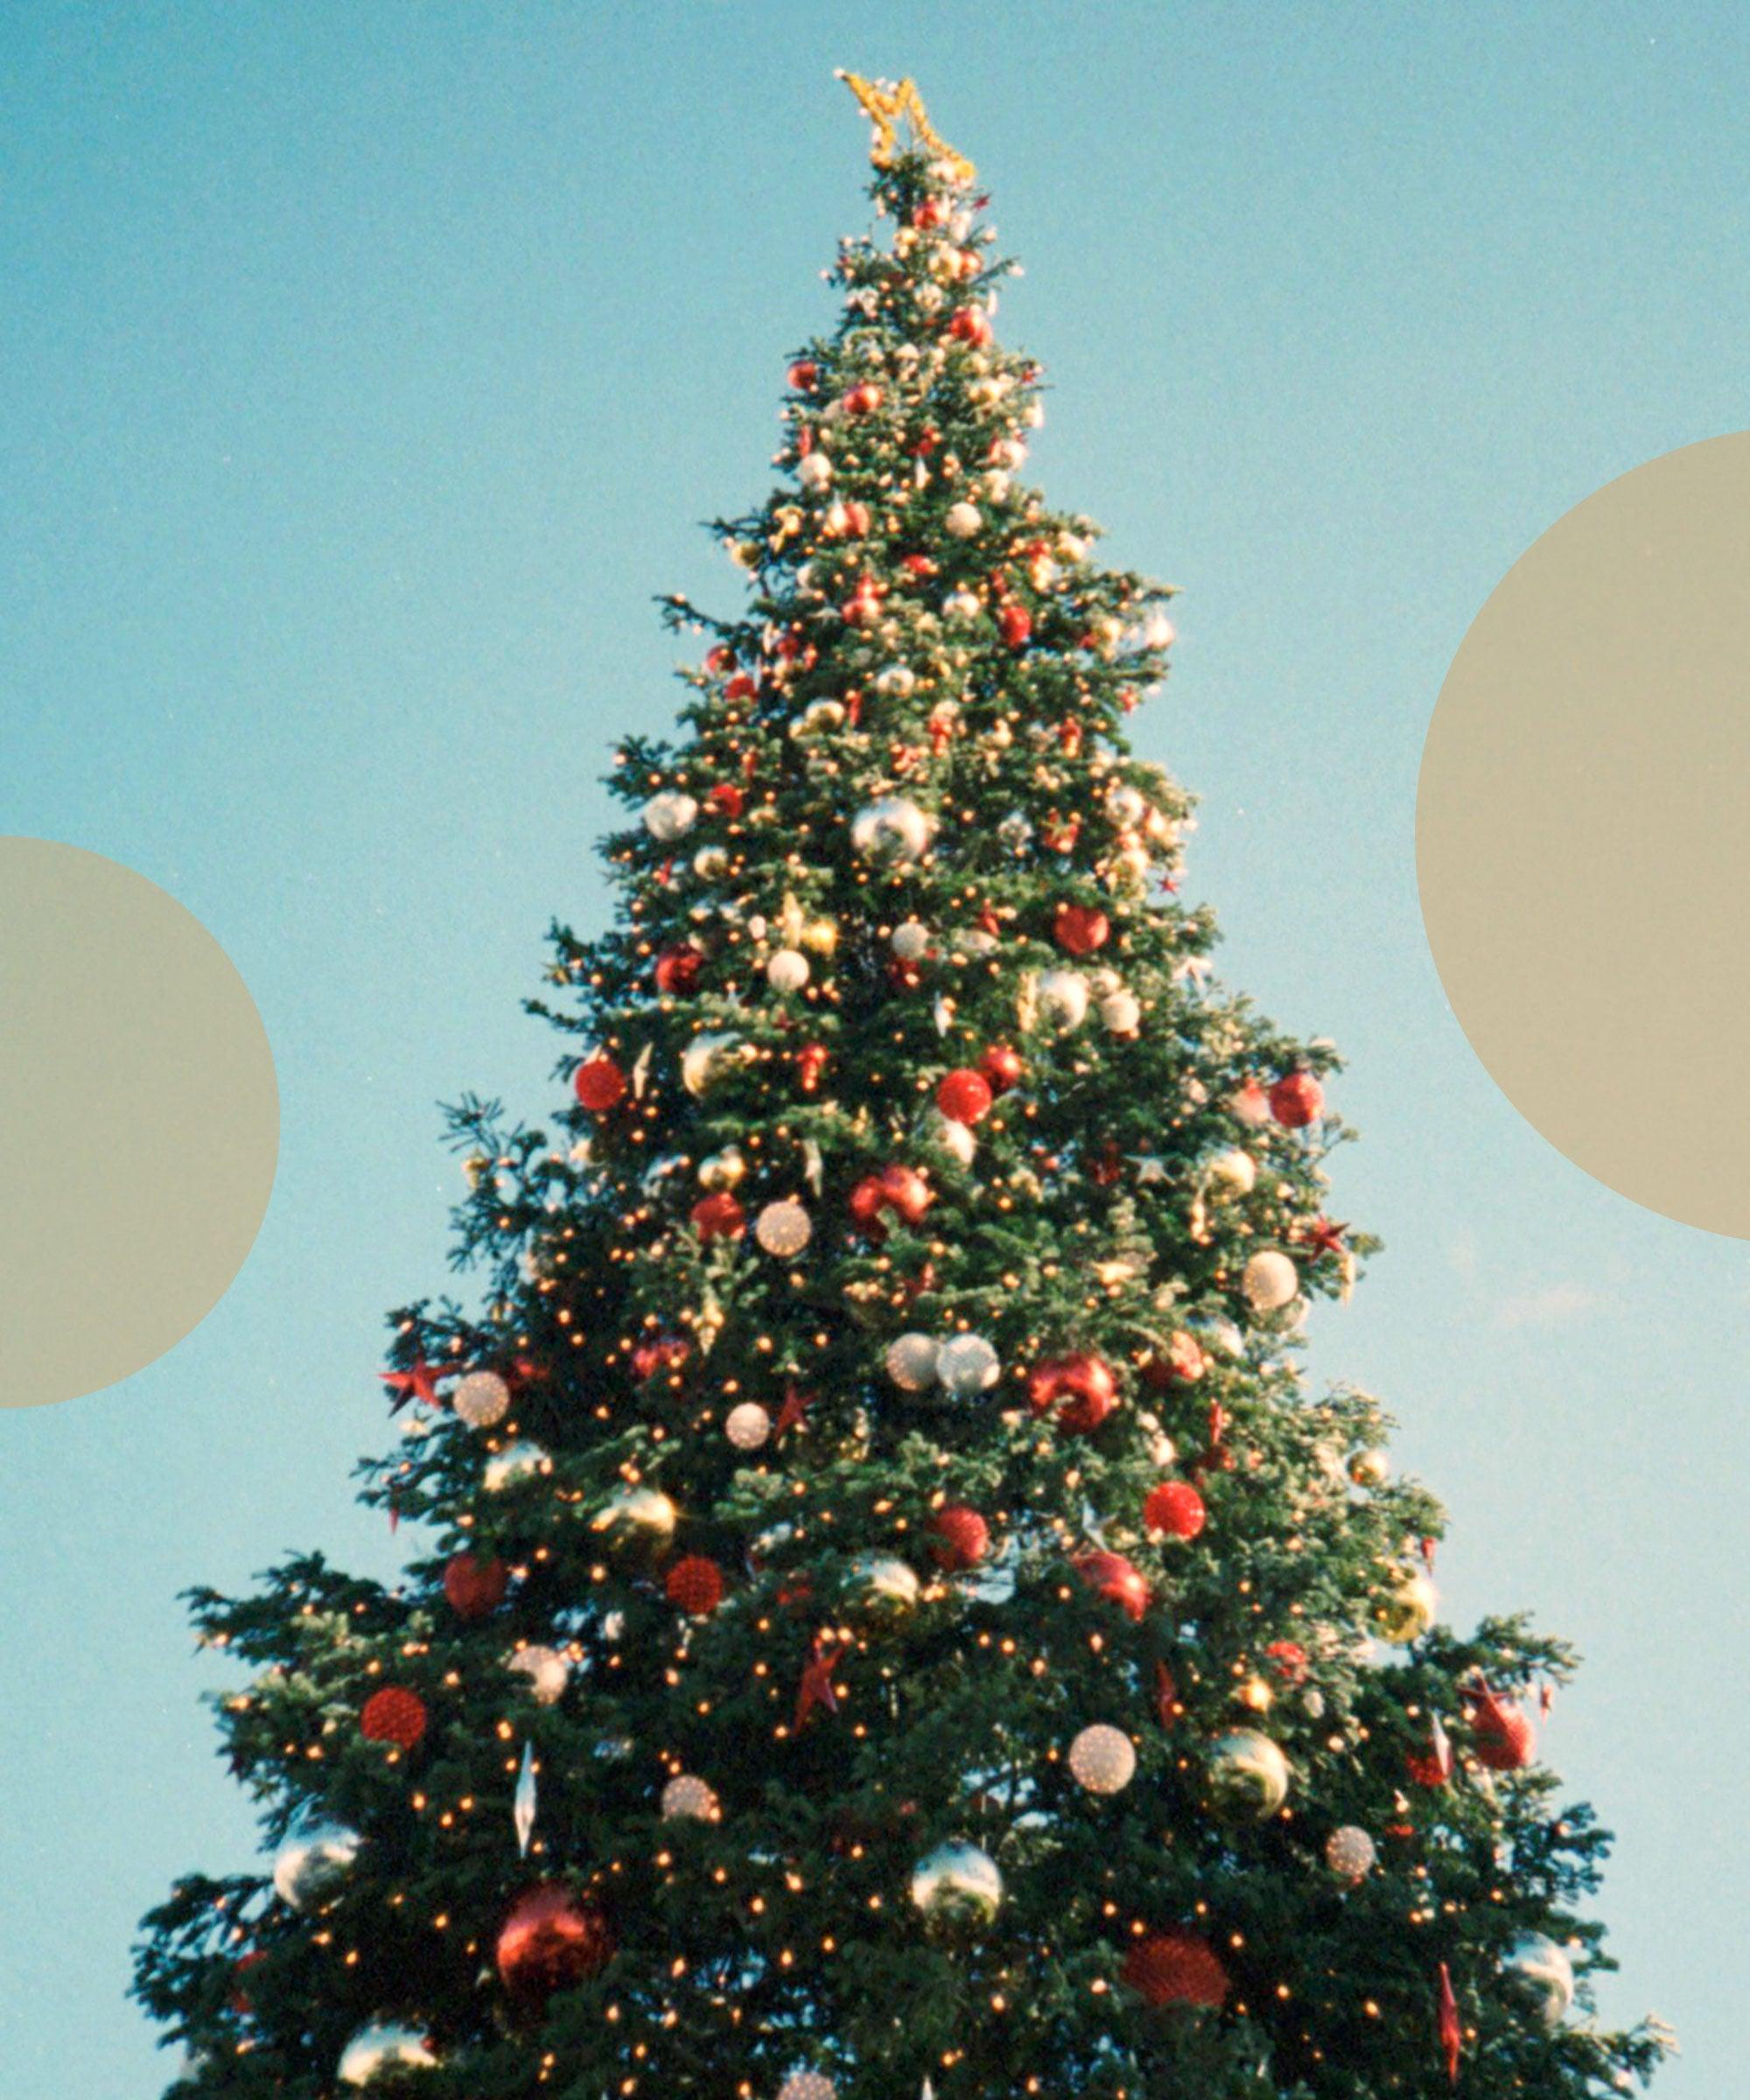 Christmas Tree Shortage 2019 Due To